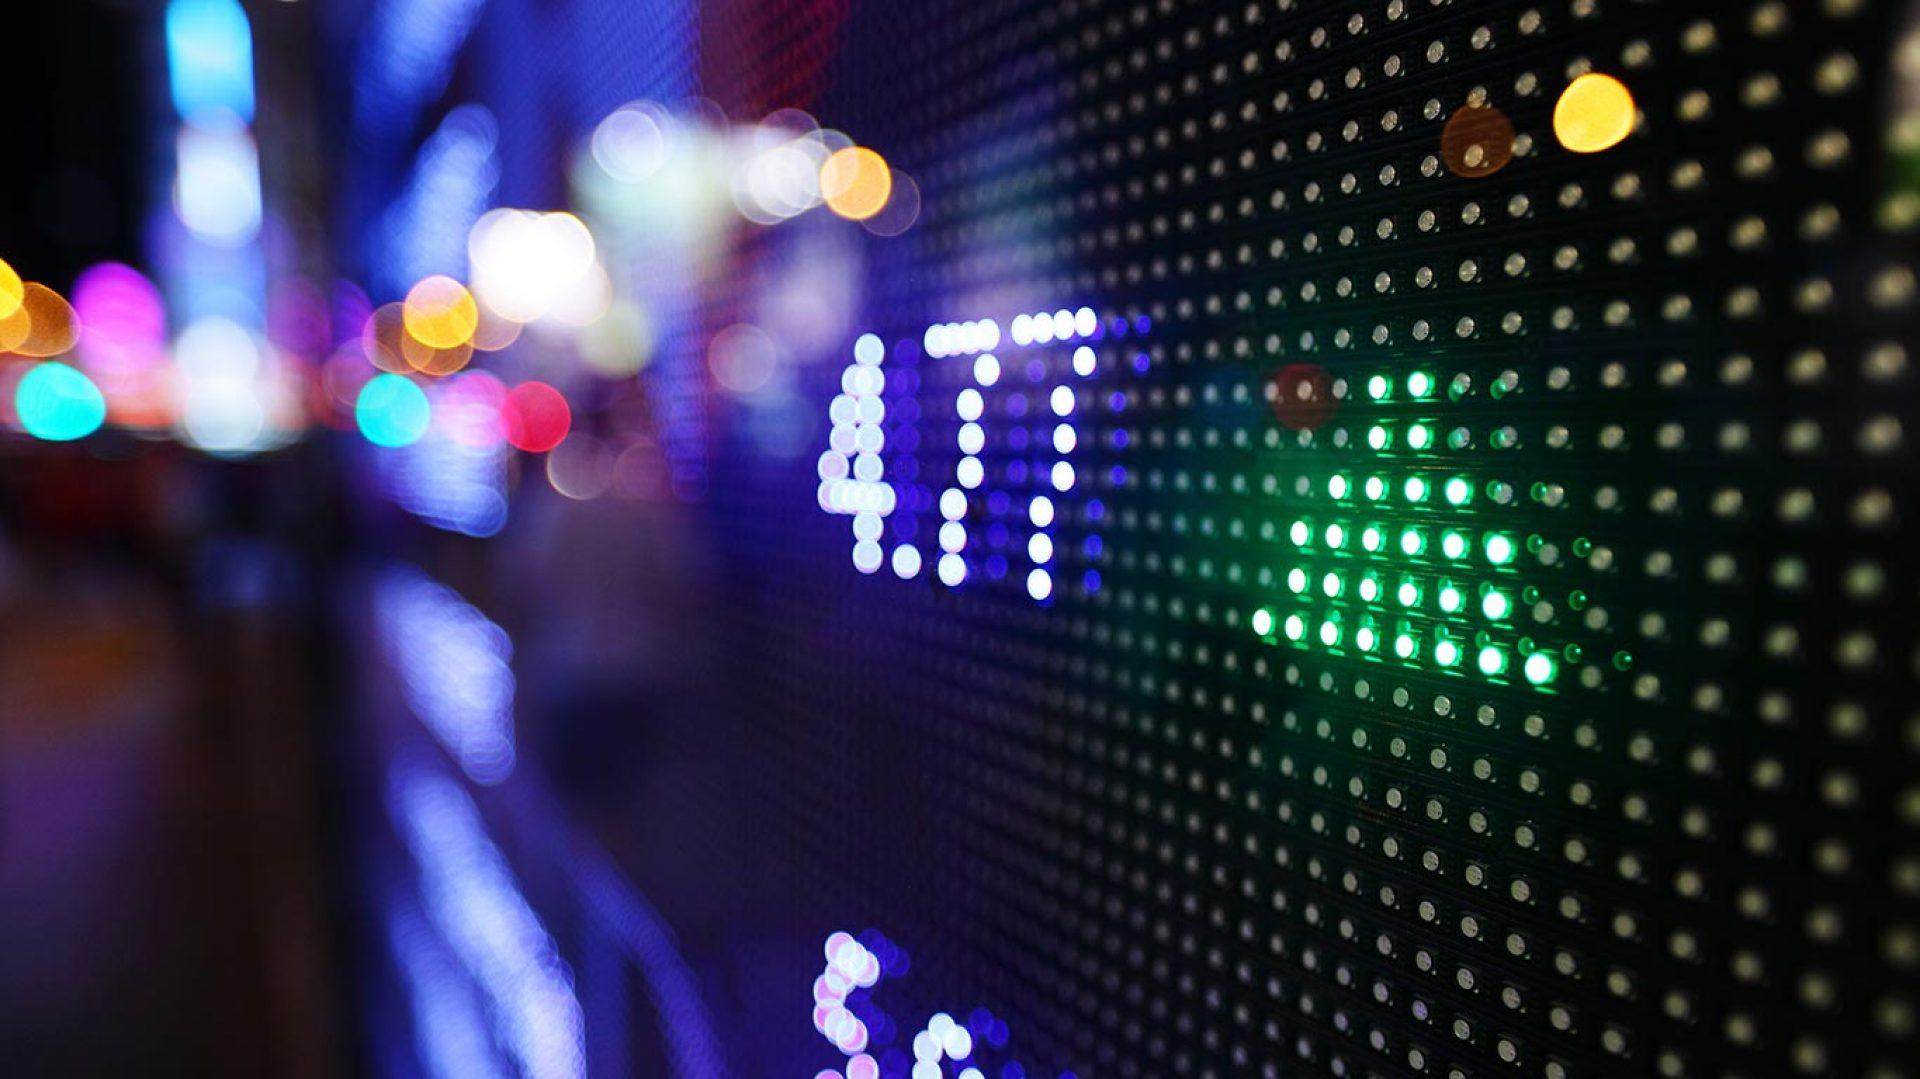 Prillach Financial Technologies Ltd